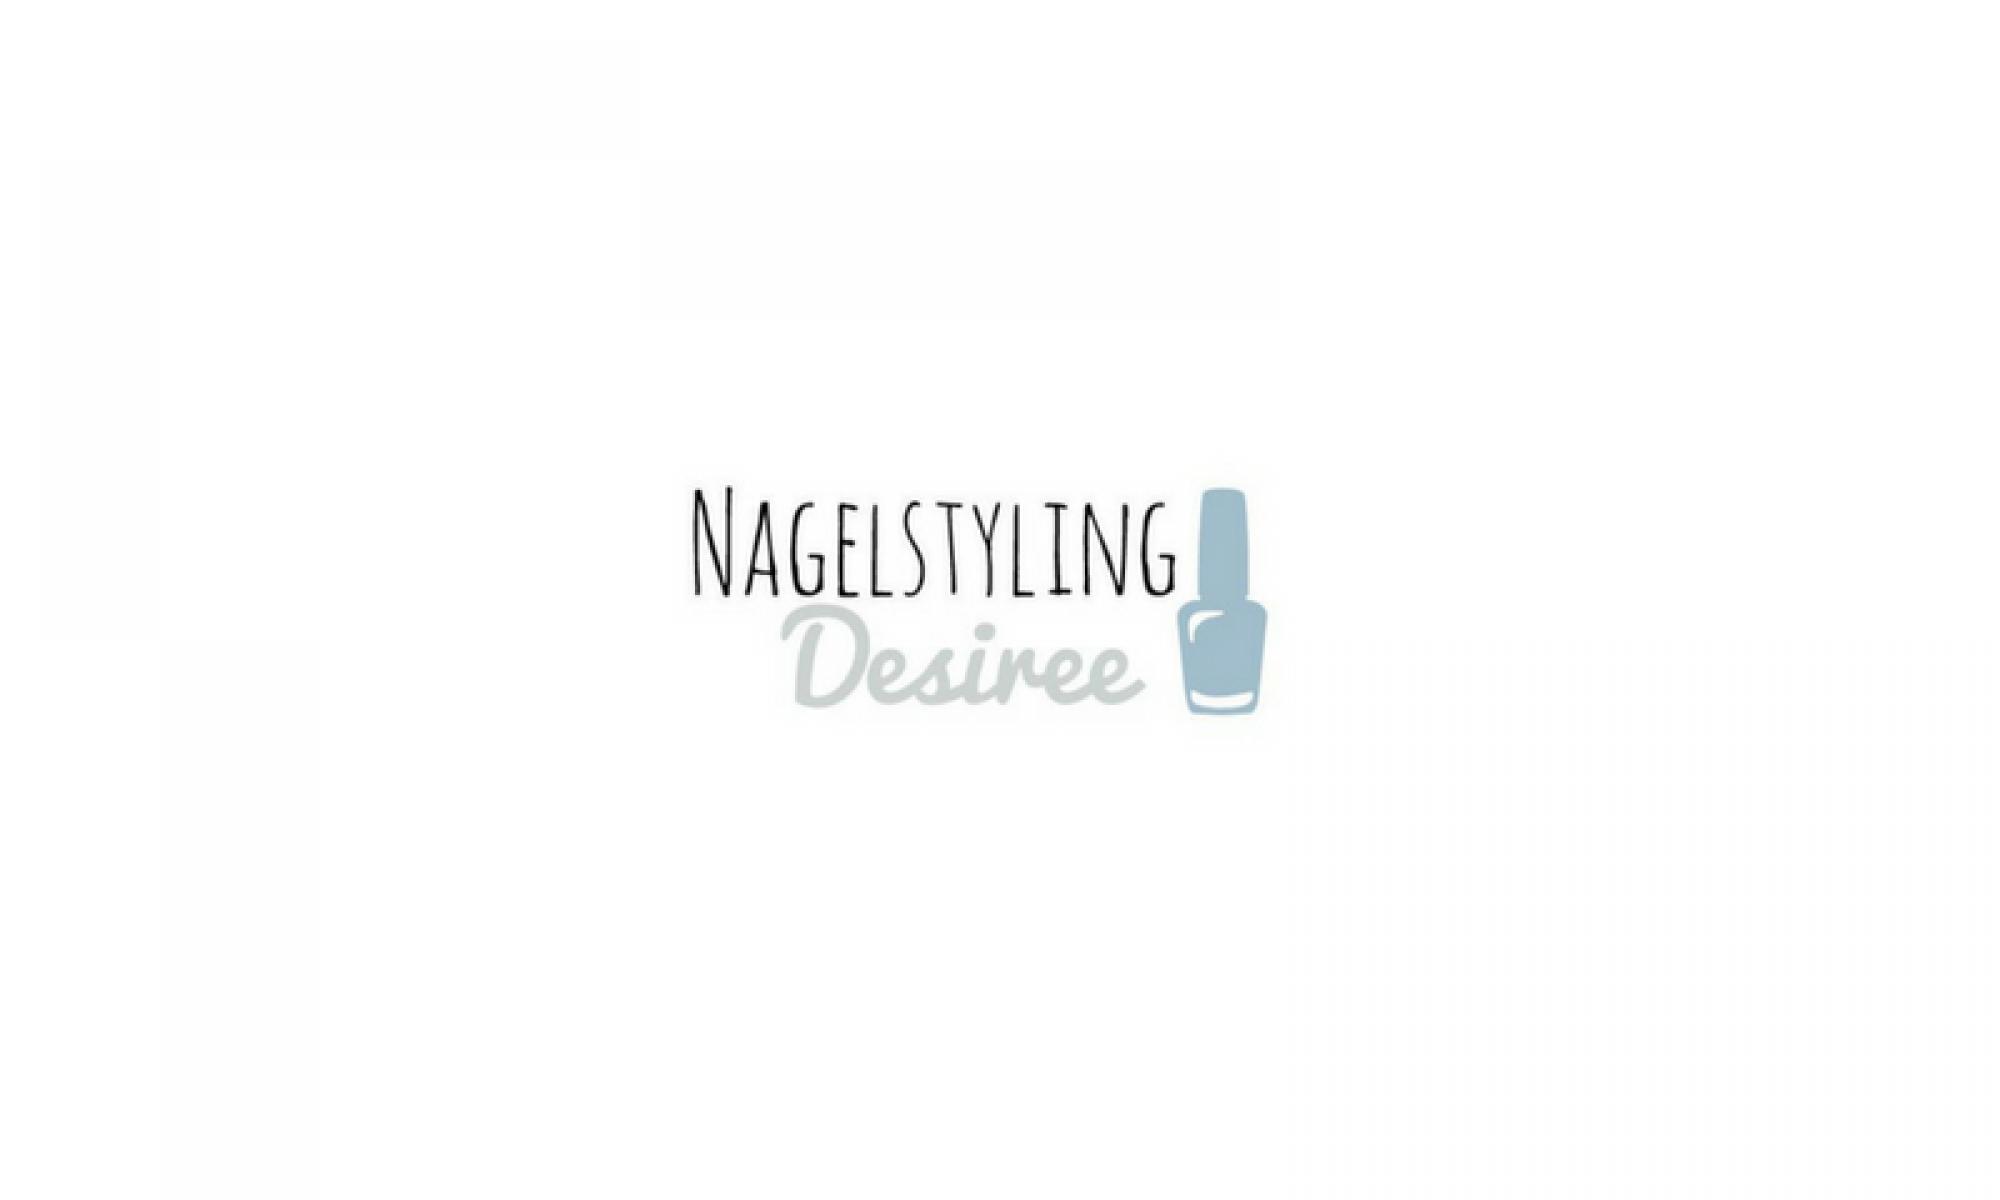 Nagelstyling desiree